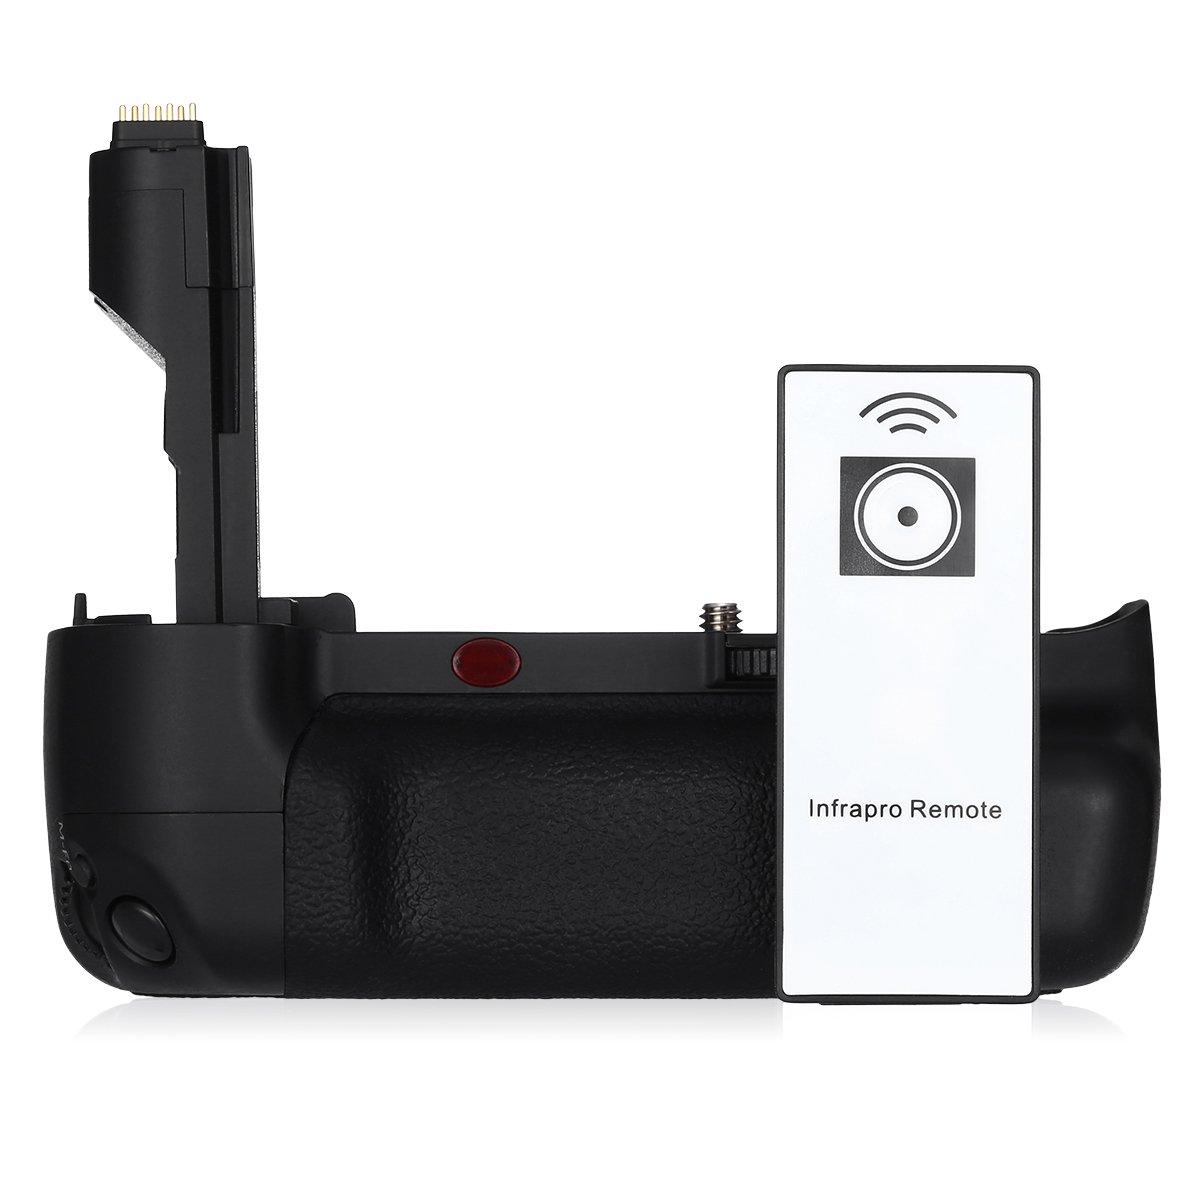 Powerextra BG-E7 Vertical Battery Grip Canon EOS 7D Digital SLR Camera Infrared Remote Control Work LP-E6/LP-E6N 6 AA-Size Battery